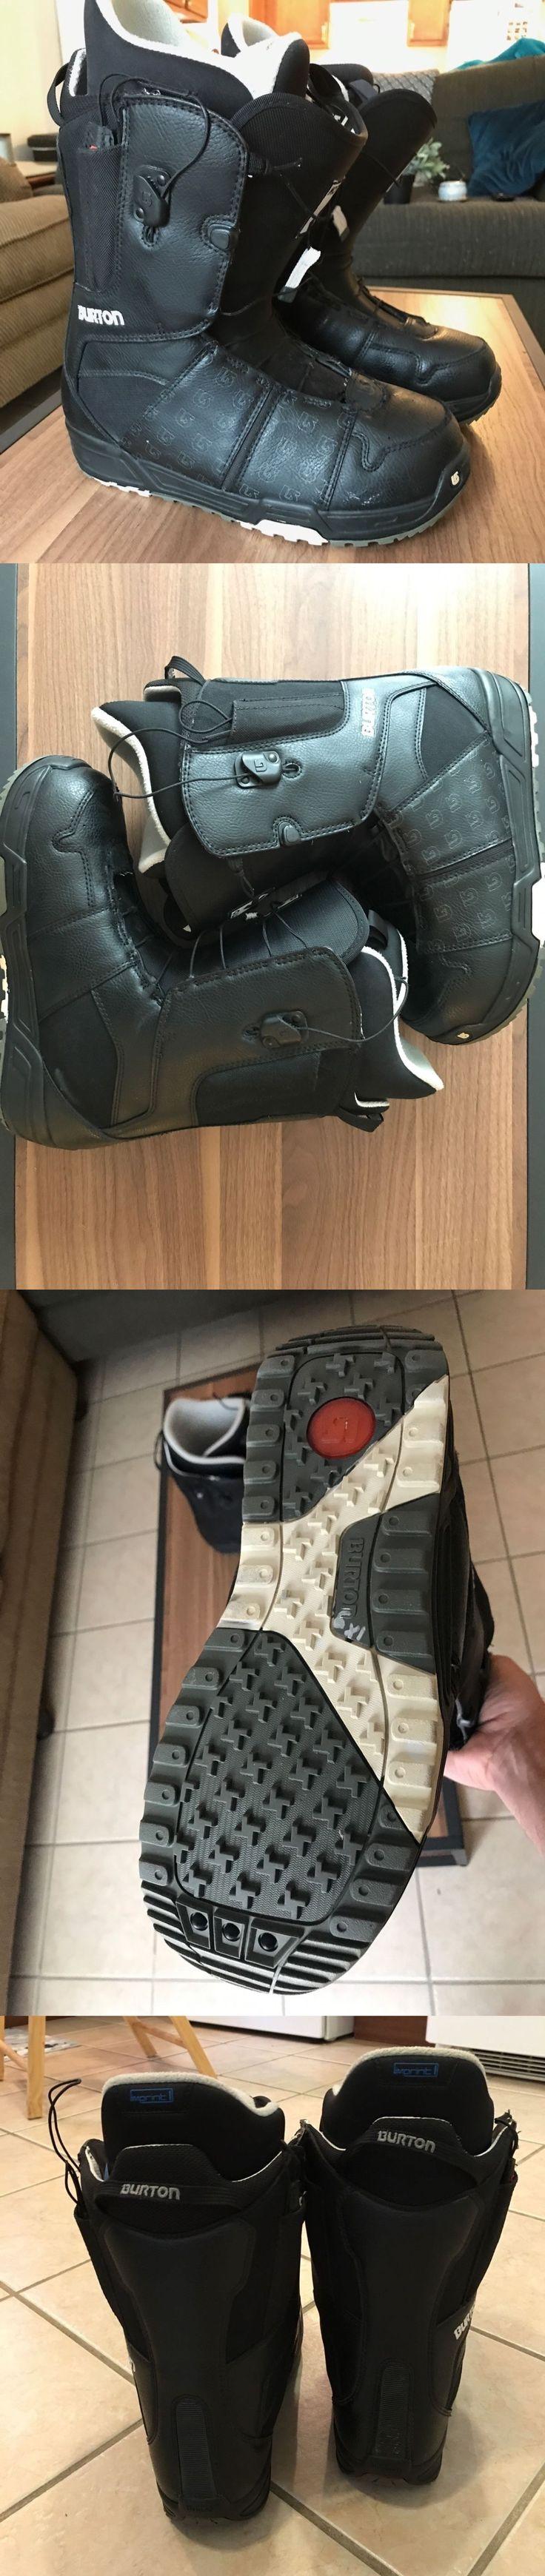 Bindings 21248: Burton Moto Men S Snowboard Boots Size 10 Snowboarding Gear Snow Boots -> BUY IT NOW ONLY: $65 on eBay!